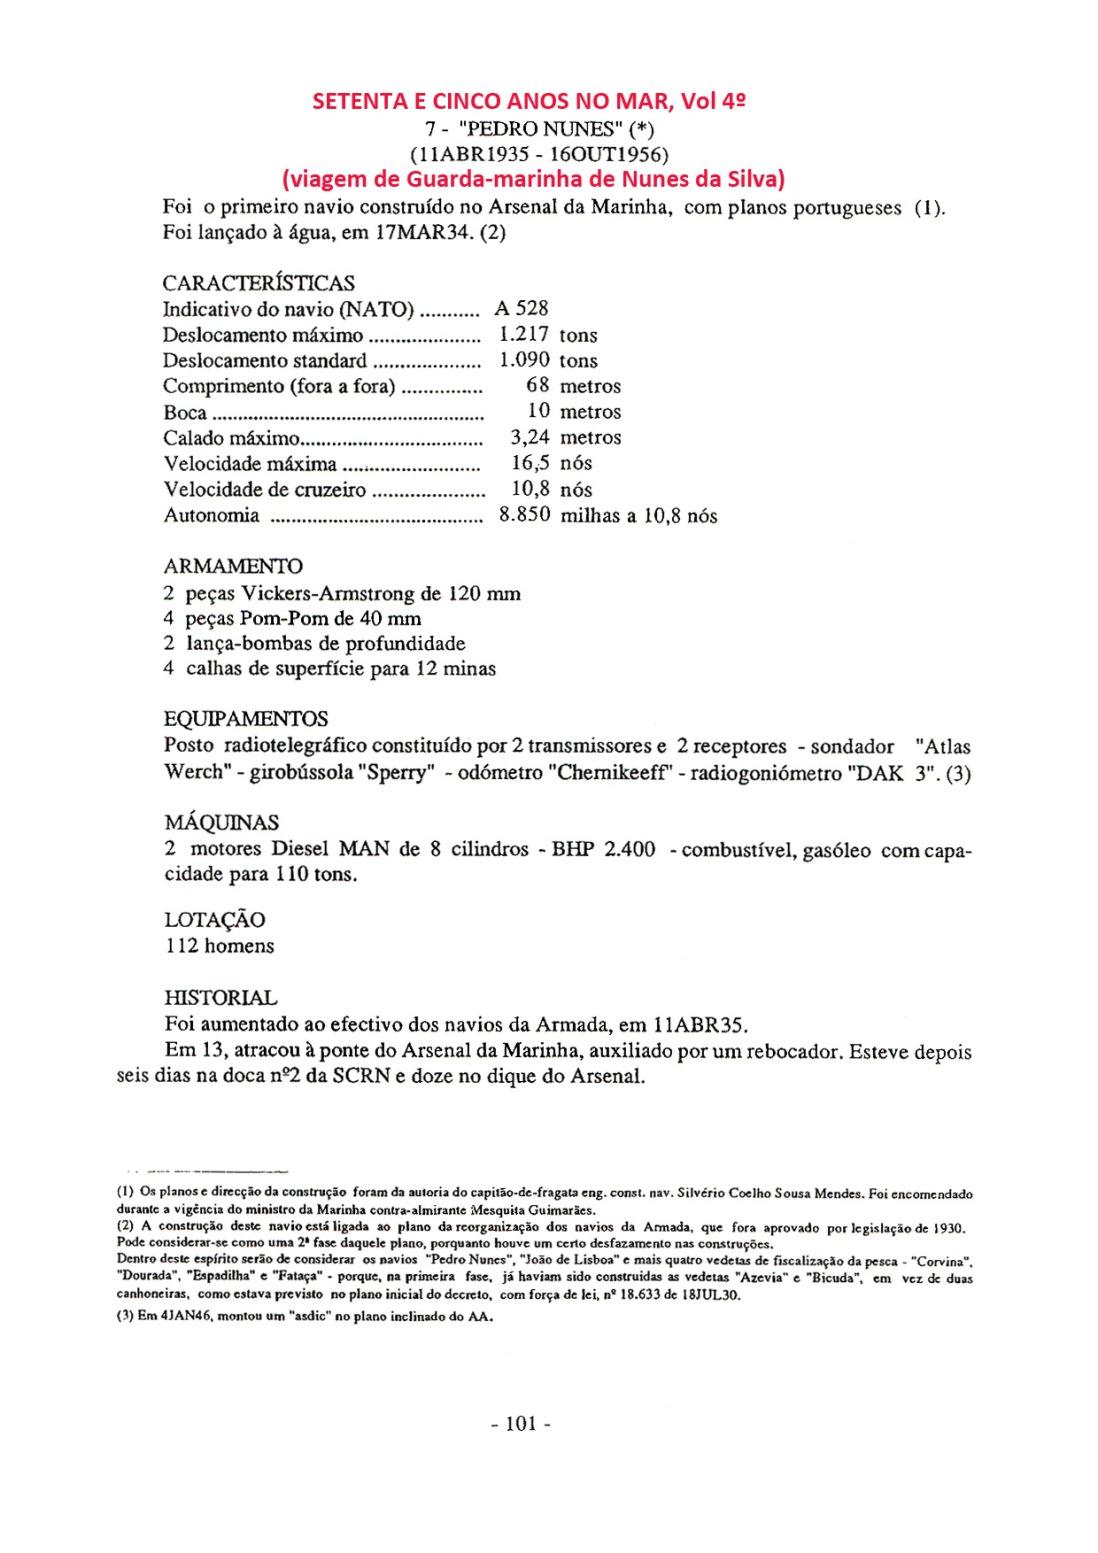 00079 Características do Pedro Nunes -Setenta e Cinco Anos no Mar, vol  4